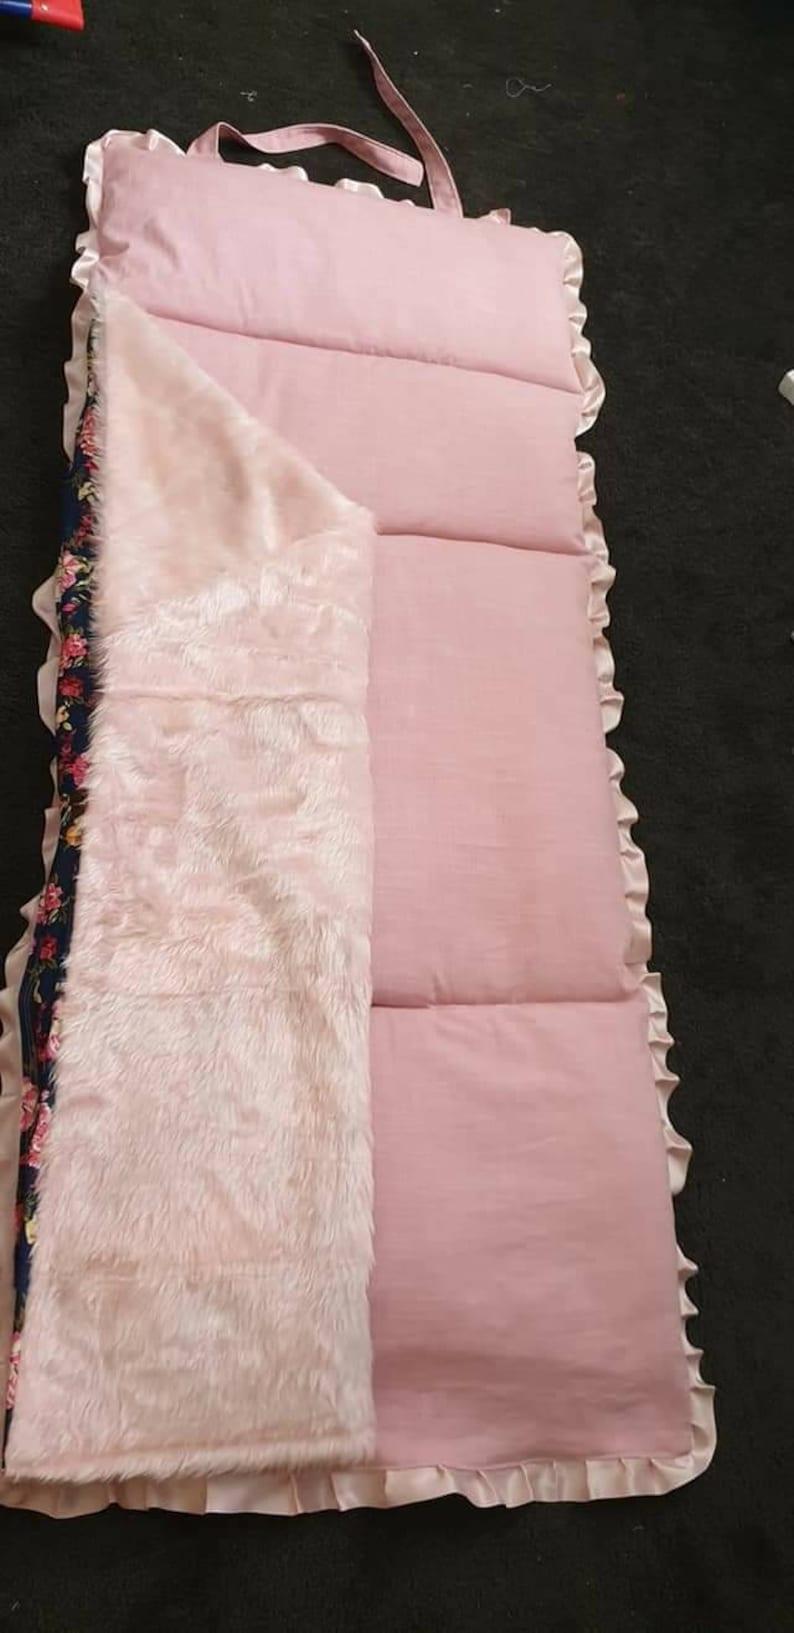 Travel sleep mat